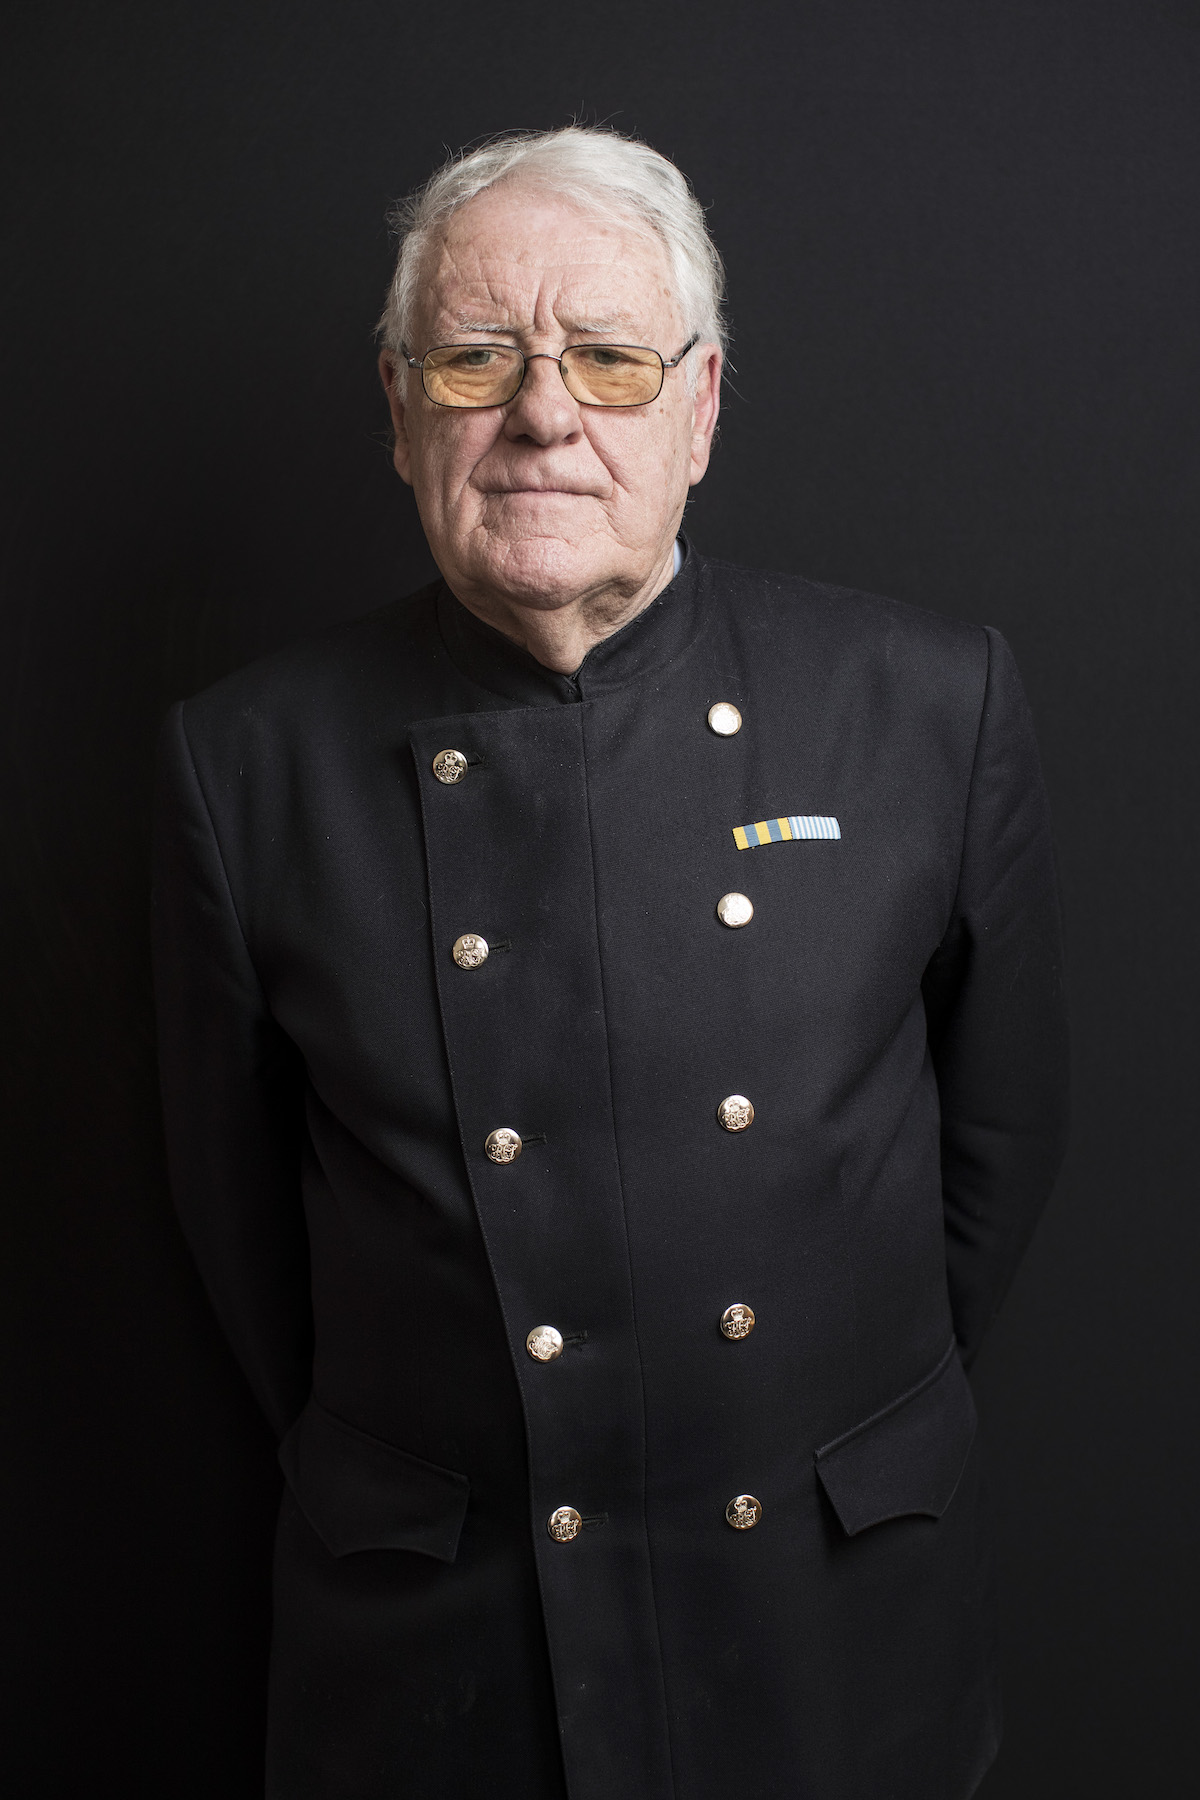 Gerry Farmer - Chelsea Pensioner